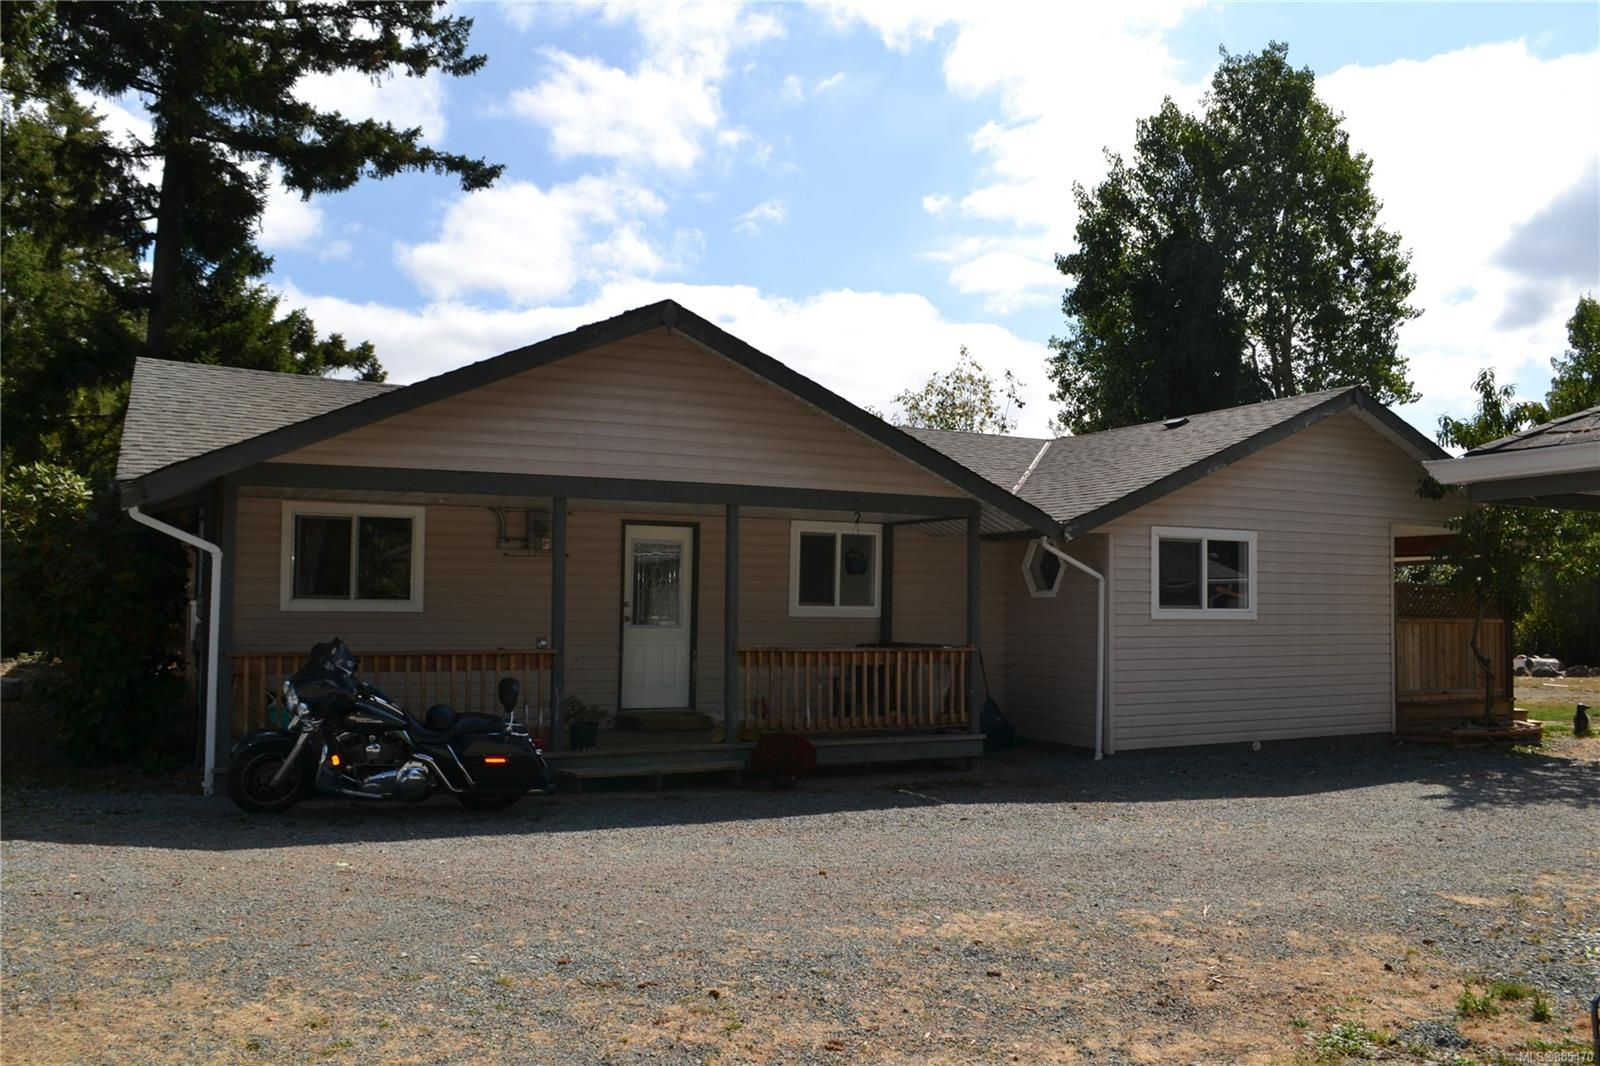 Main Photo: 1710 W Koksilah Rd in : Du Cowichan Bay House for sale (Duncan)  : MLS®# 885470